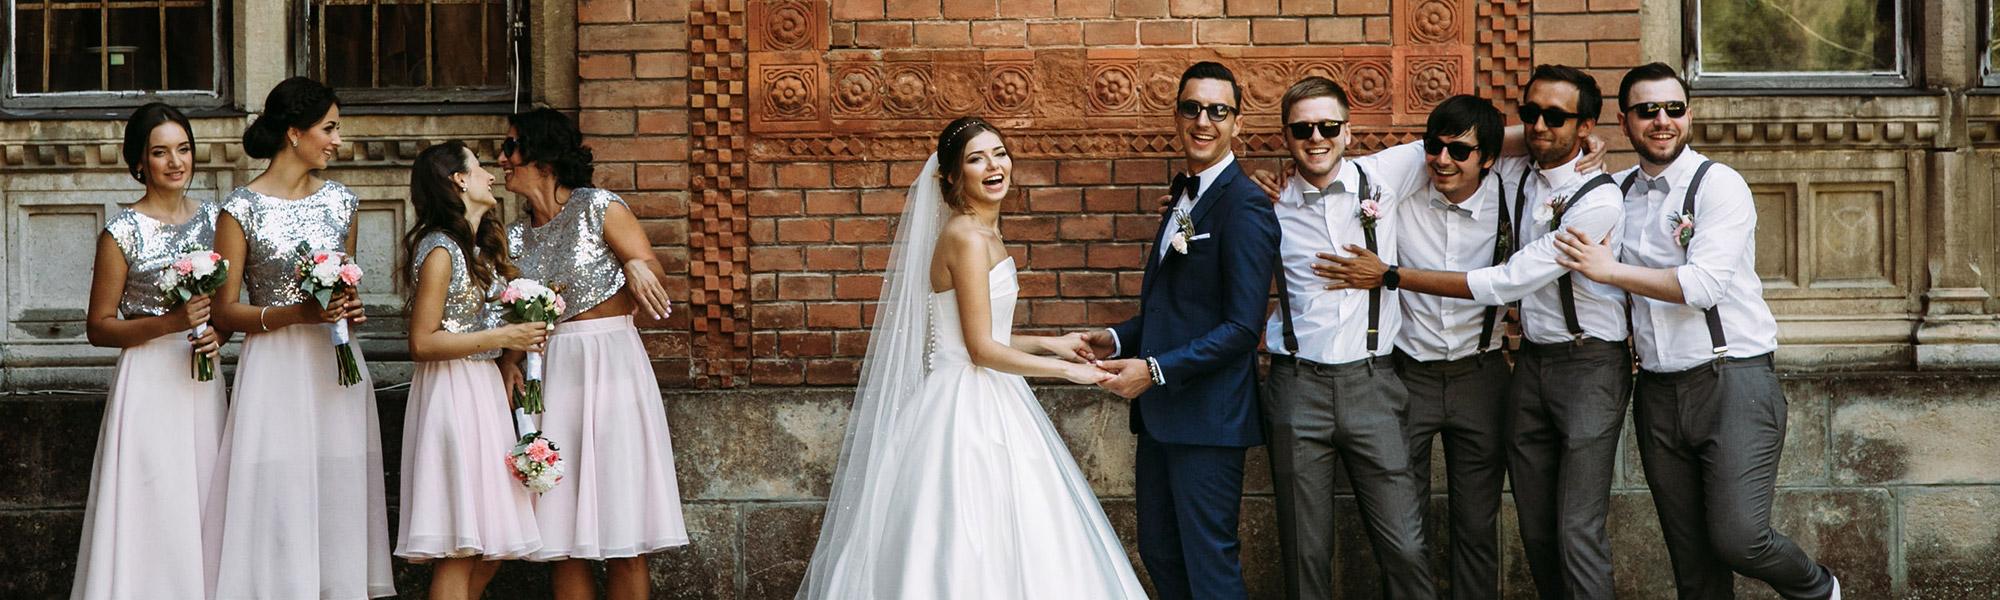 The Face Boss Bridal Wedding Makeup